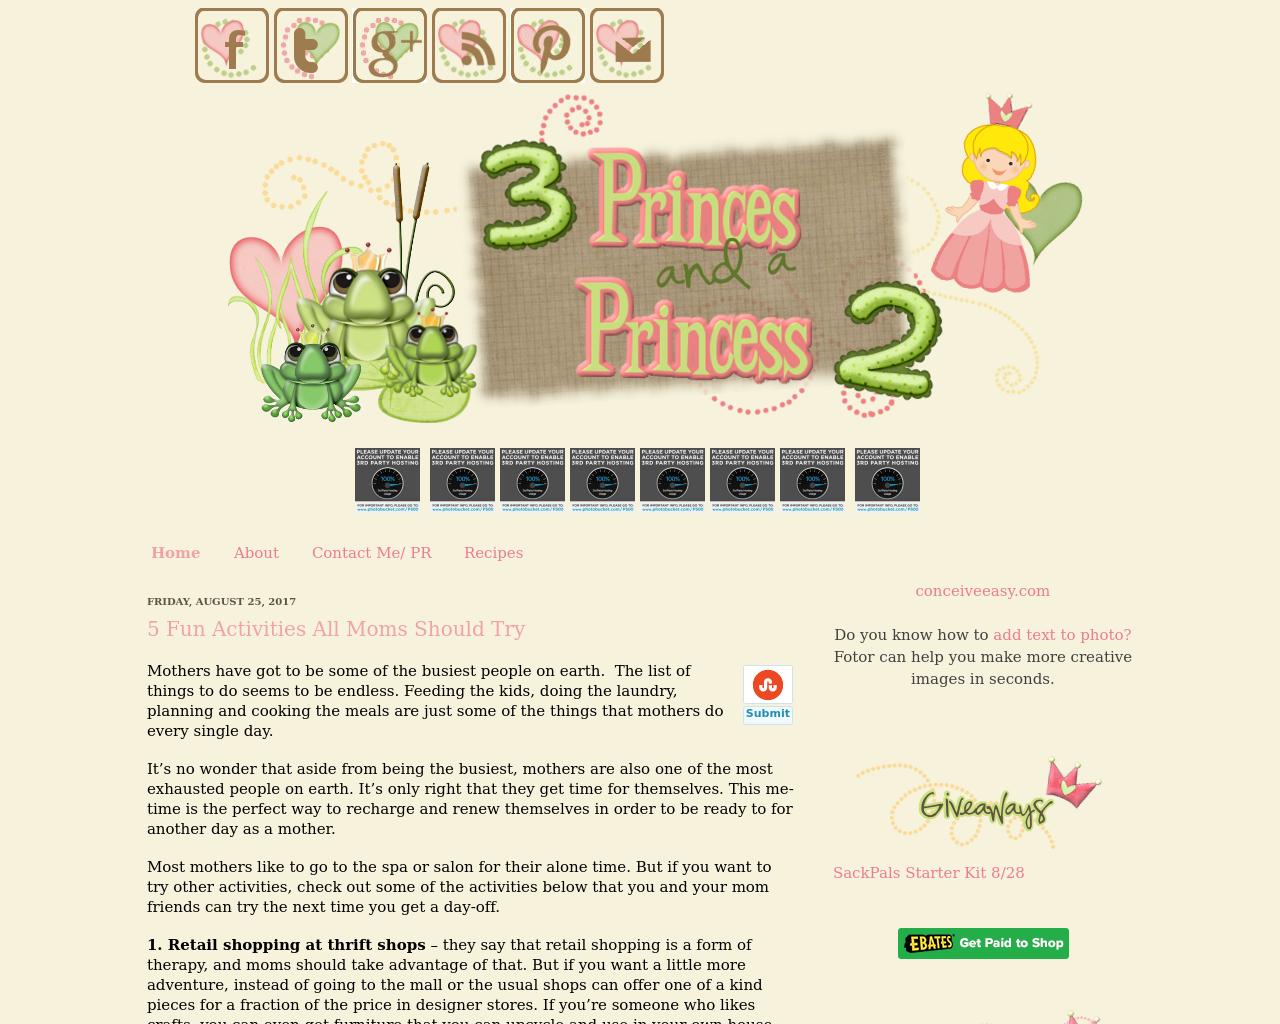 3-Princes-And-A-Princess-2-Advertising-Reviews-Pricing